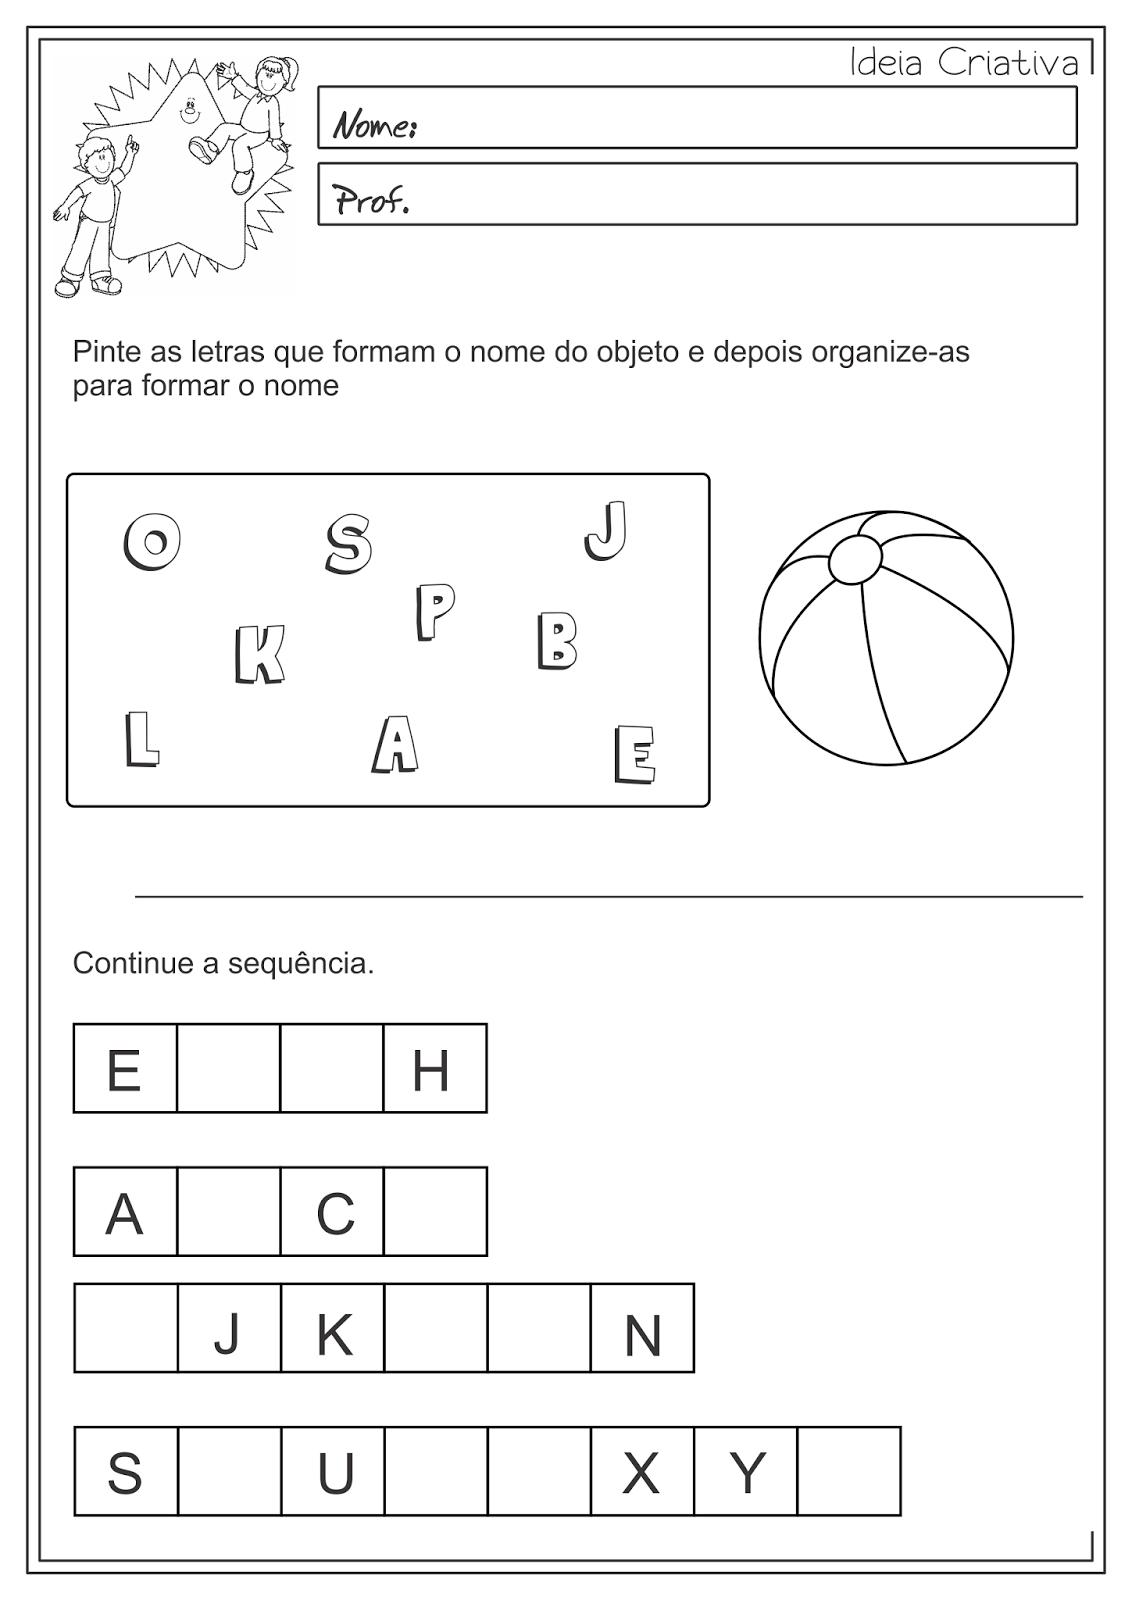 Atividade Educativa Ordem Alfabética Língua Portuguesa 3° ano Fundamental